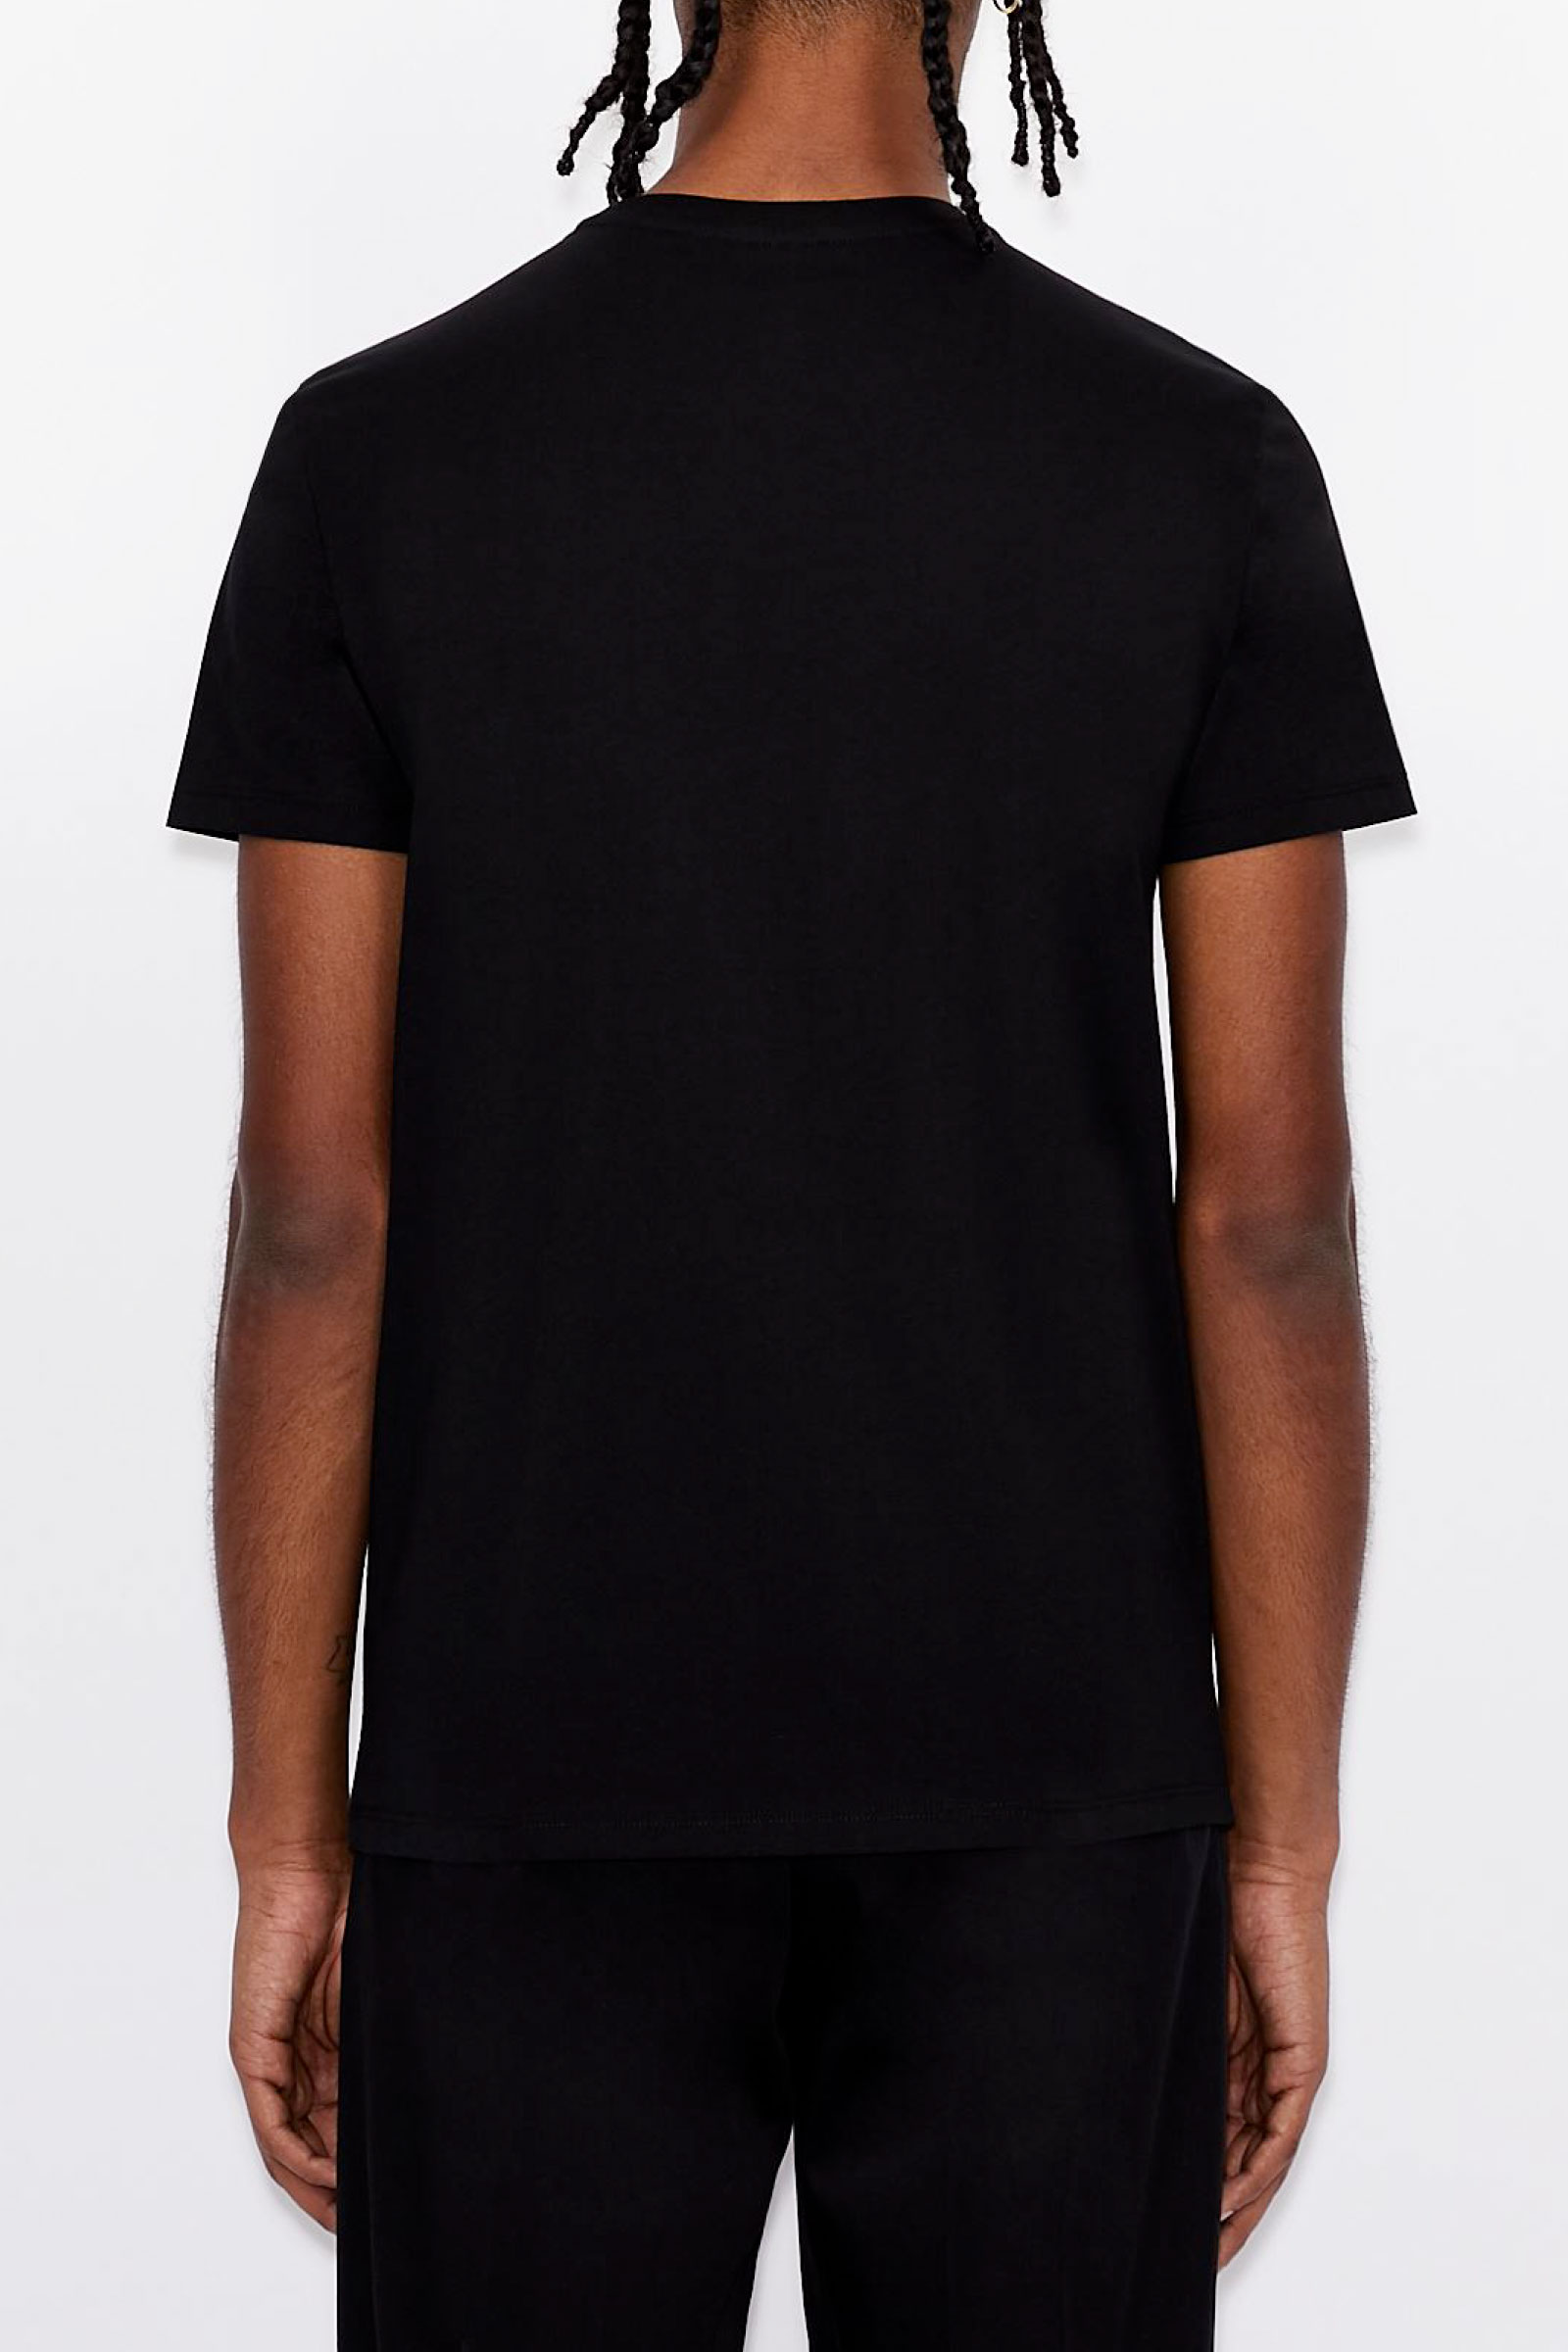 ARMANI EXCHANGE T-Shirt Uomo ARMANI EXCHANGE | T-Shirt | 3KZTAG ZJ4KZ1200